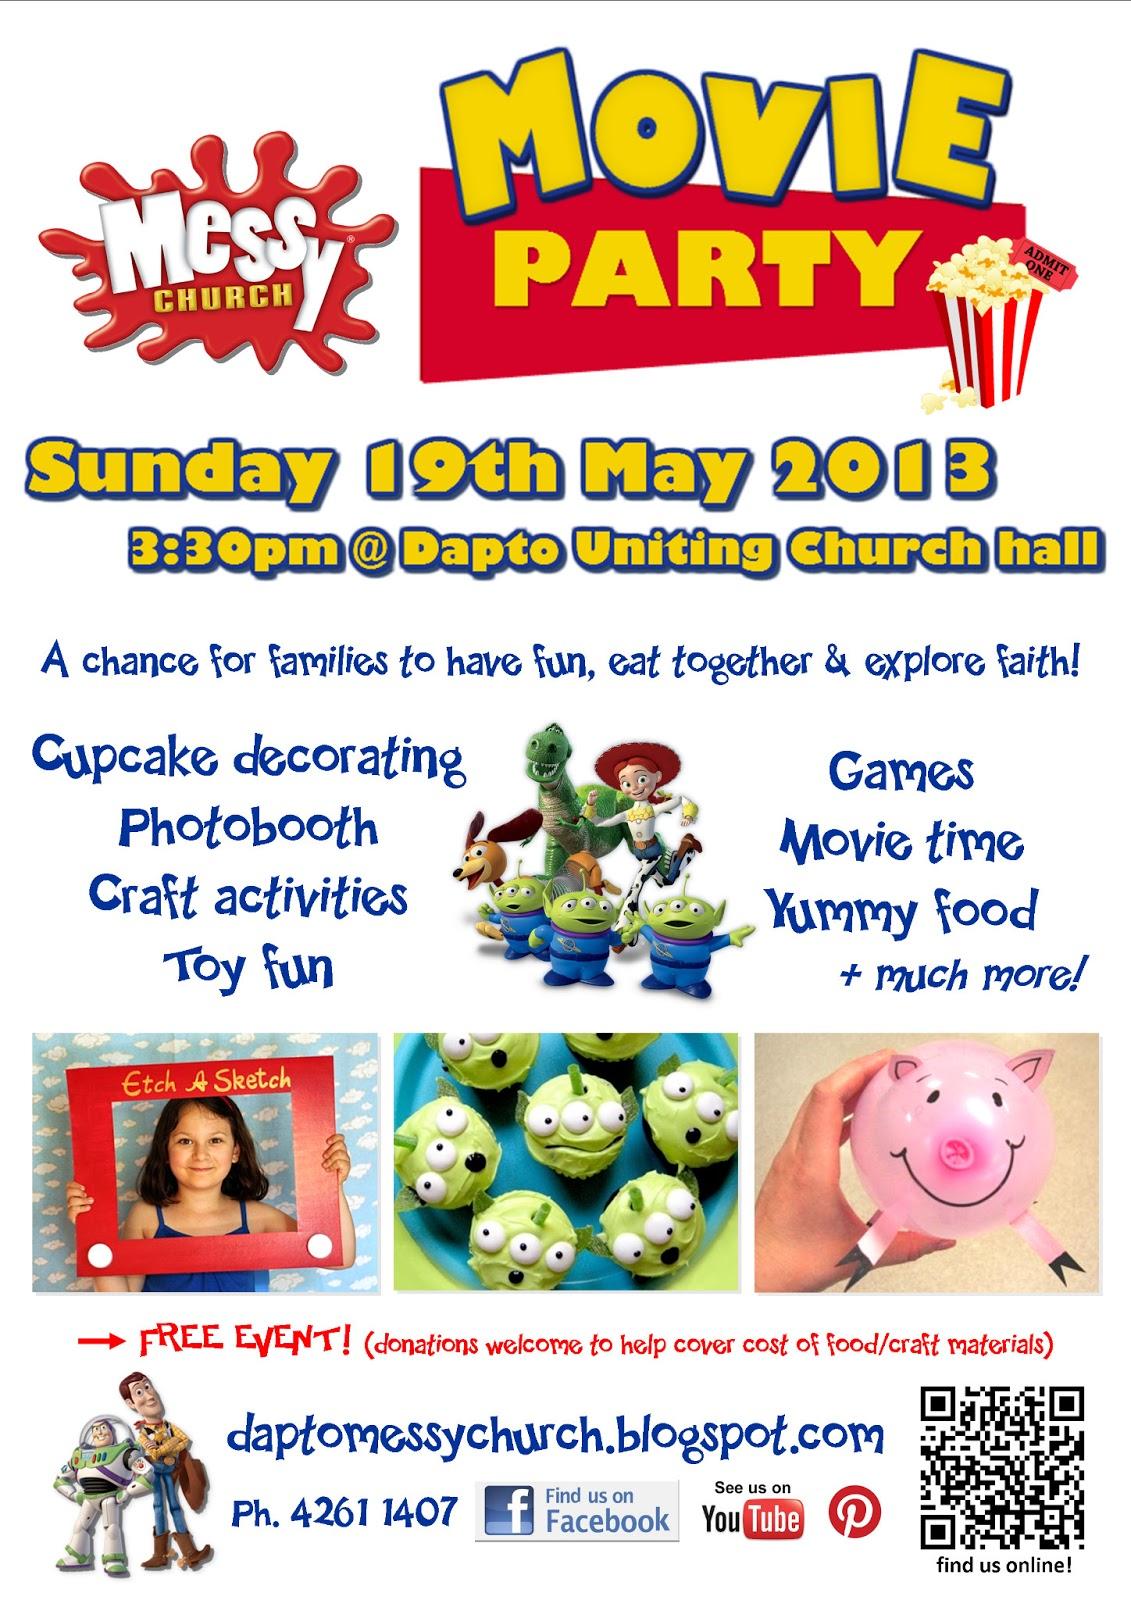 Messy Church @ Dapto Uniting: INVITE: Dapto Messy Church Movie Party